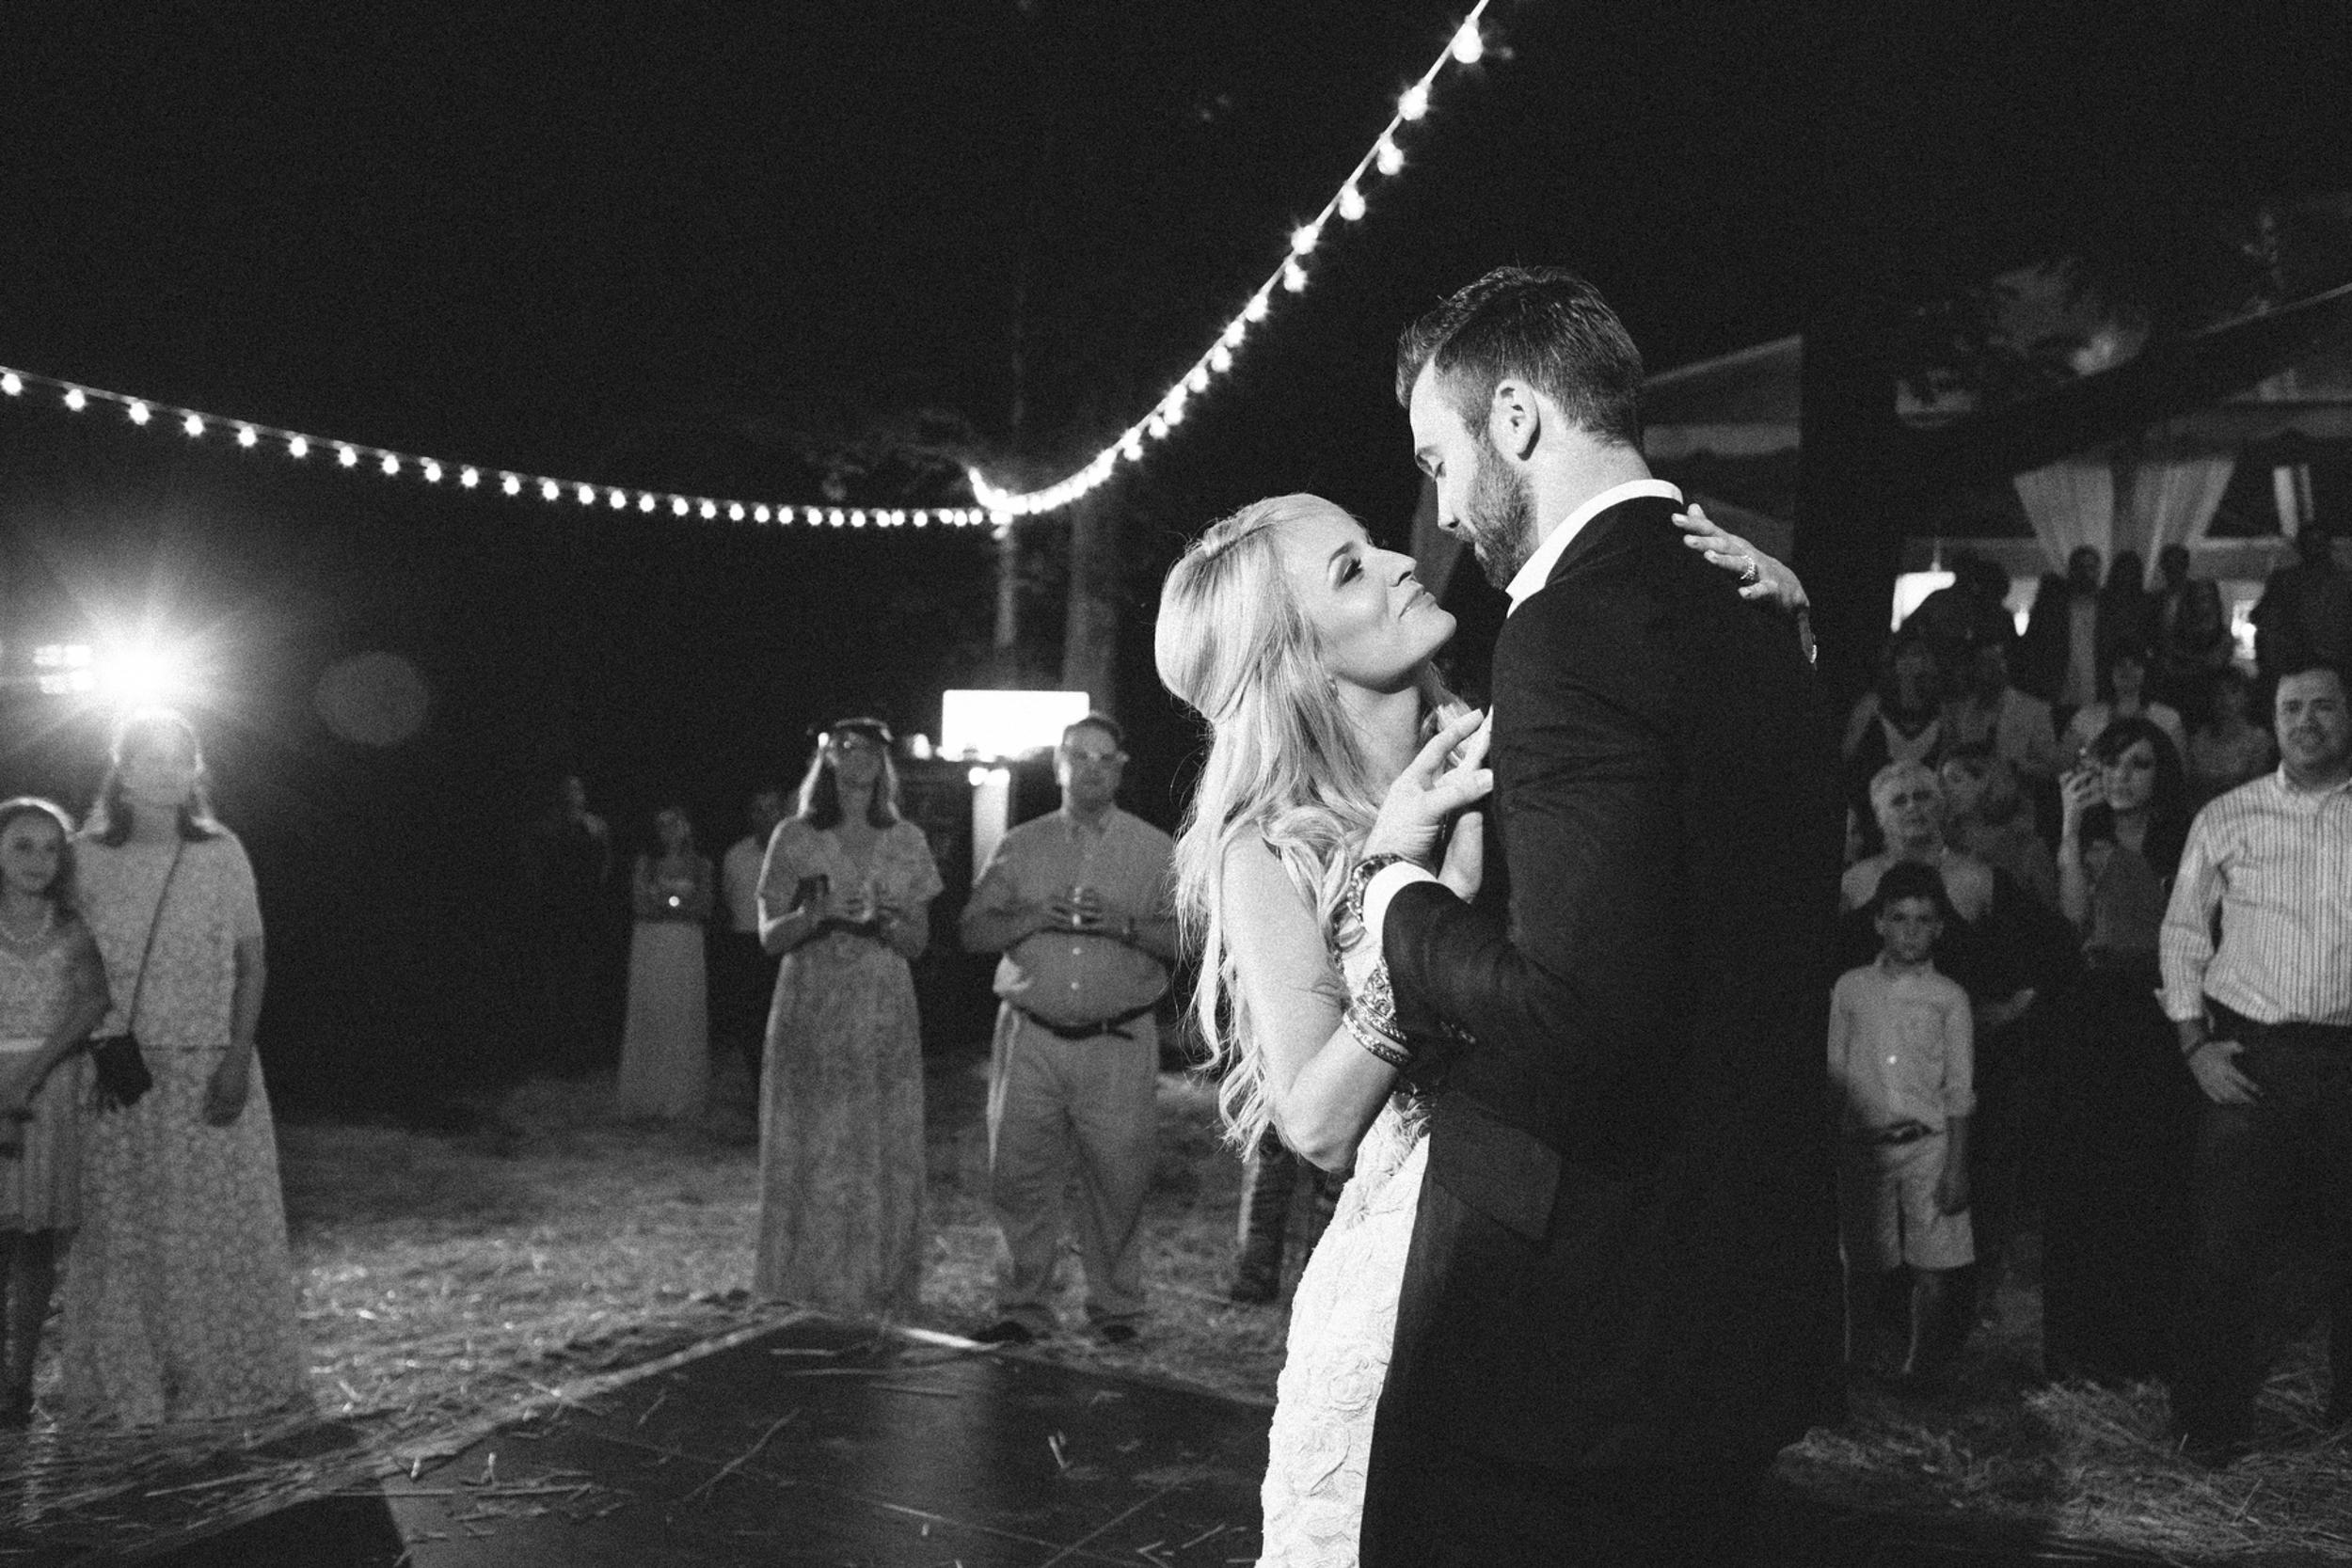 south_carolina_farm_wedding_rustic_chic_surprise_secret_luxe_wedding_bachelorette_emily_maynard_real_weddings-53.jpg